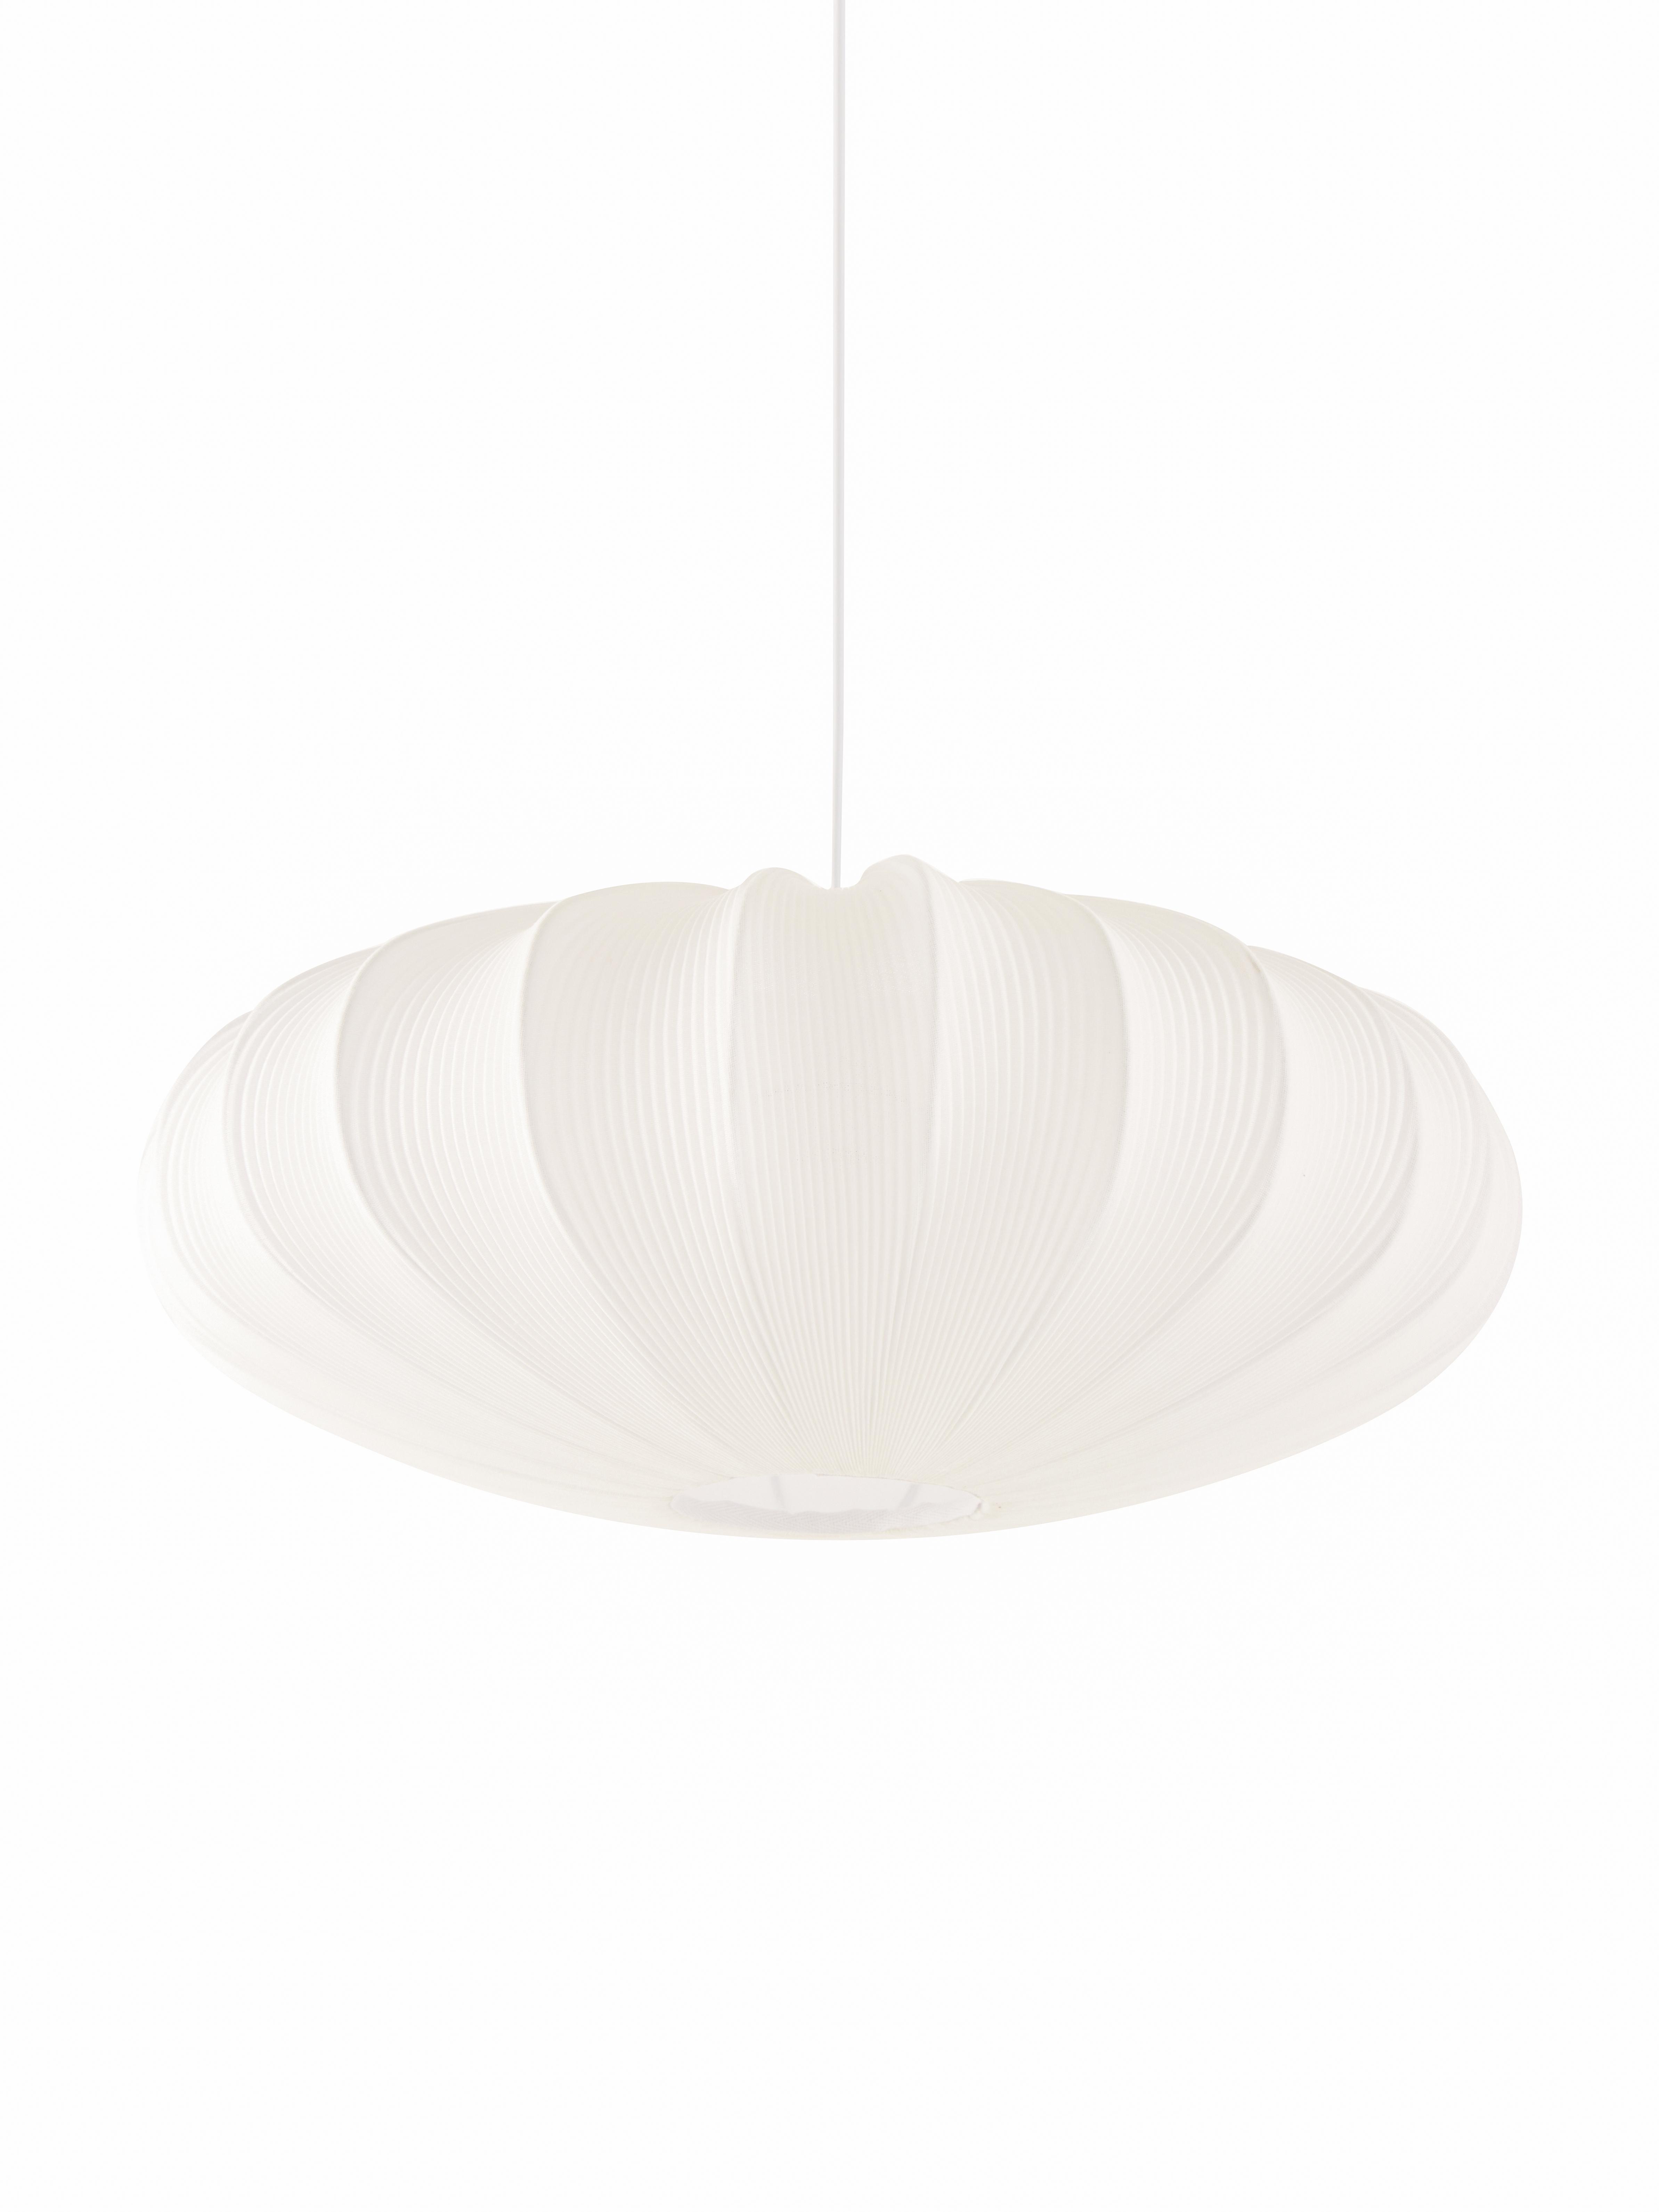 Pendelleuchte Mamsell, Lampenschirm: 60% Polyester, 40%Rayon, Gestell: Metall, Baldachin: Kunststoff, Weiß, Ø 55 x H 21 cm